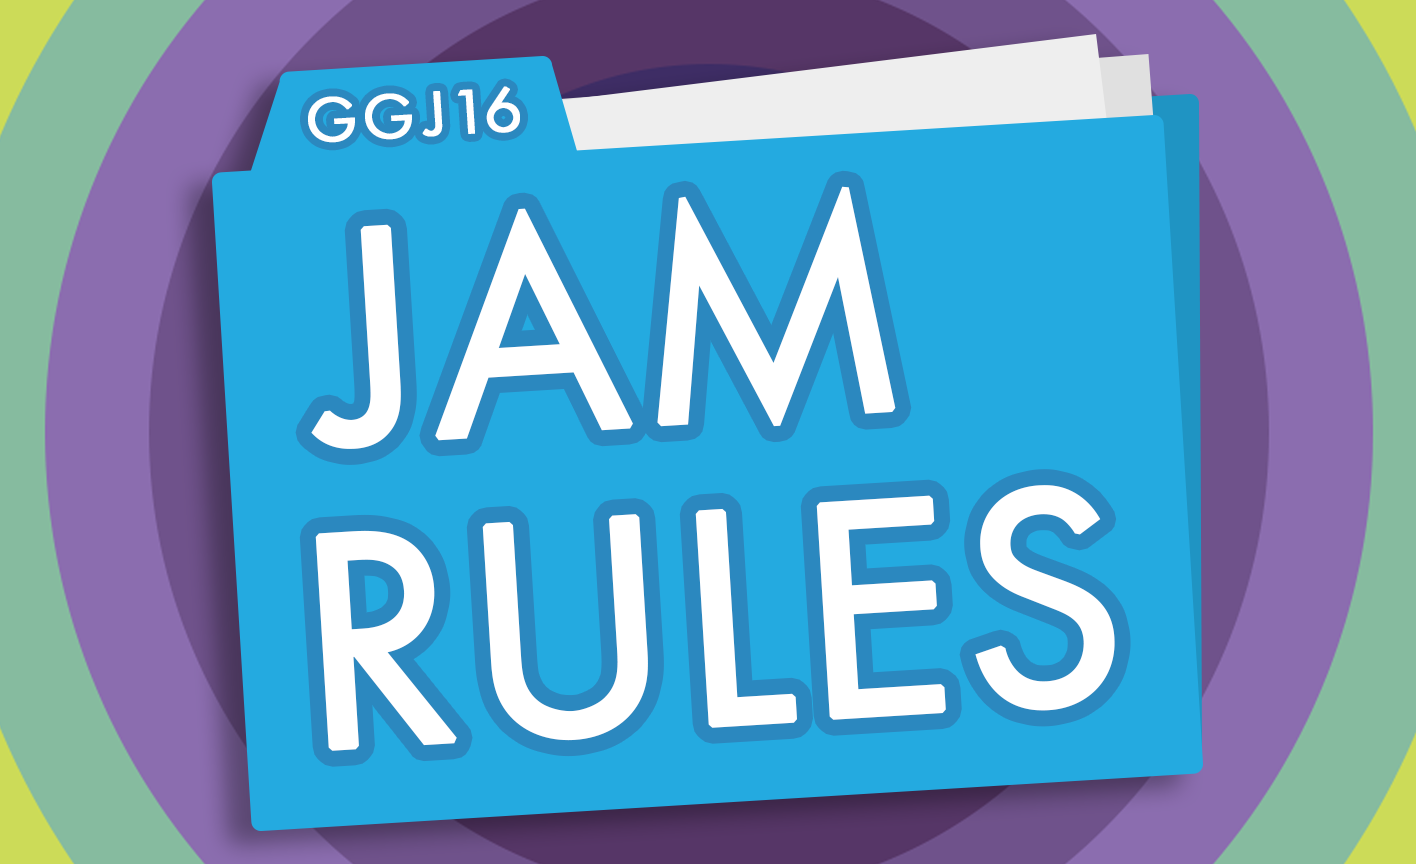 Global Game Jam® Rules 2016